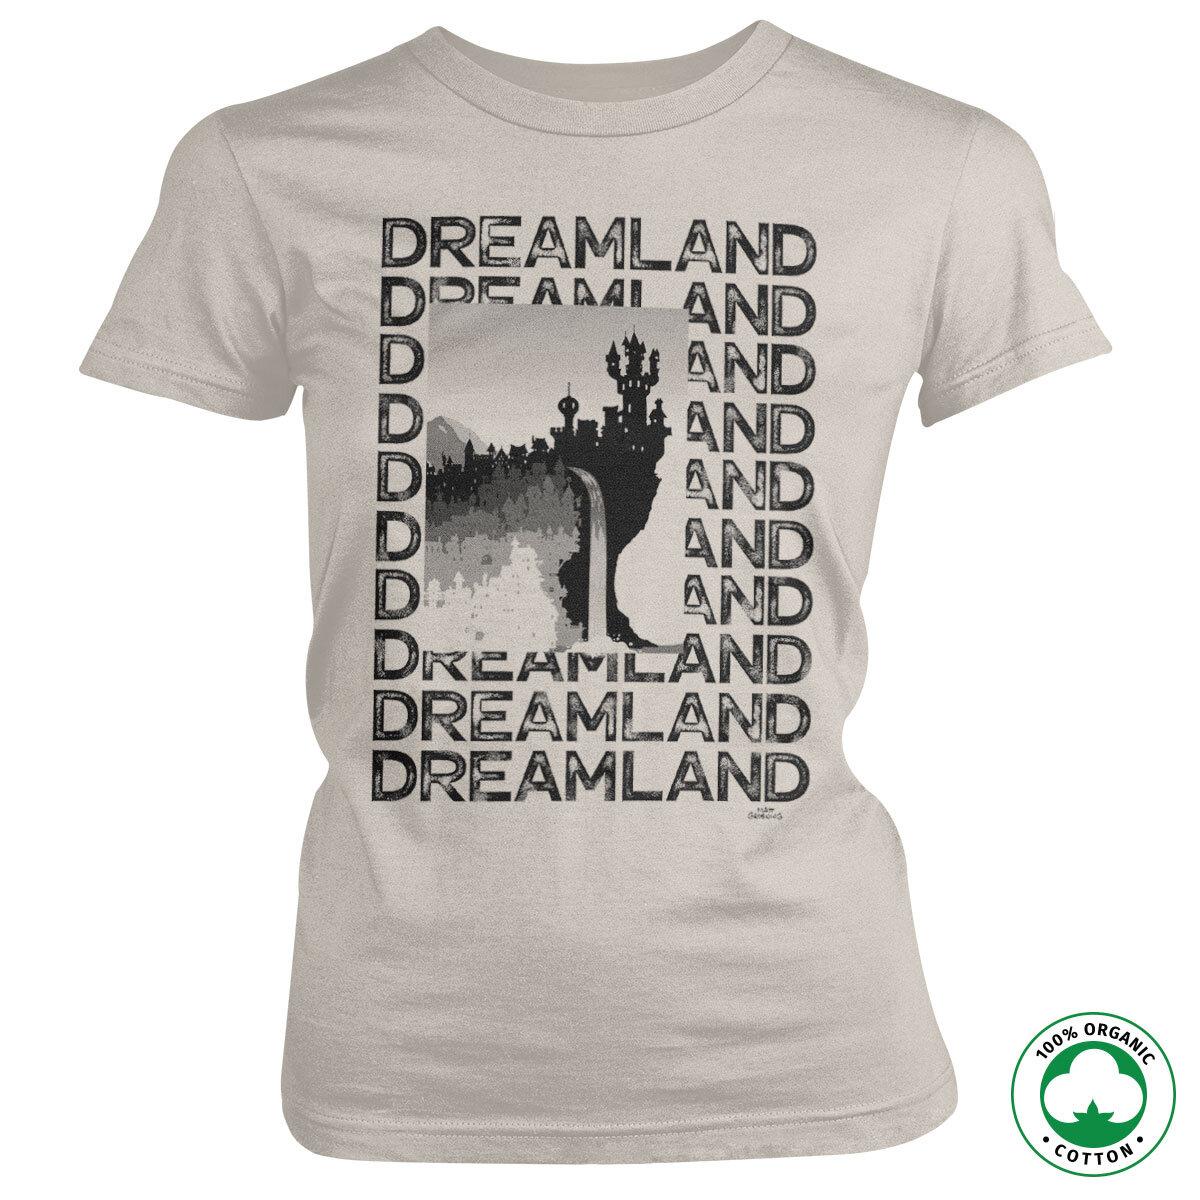 Dreamland Organic Girly Tee